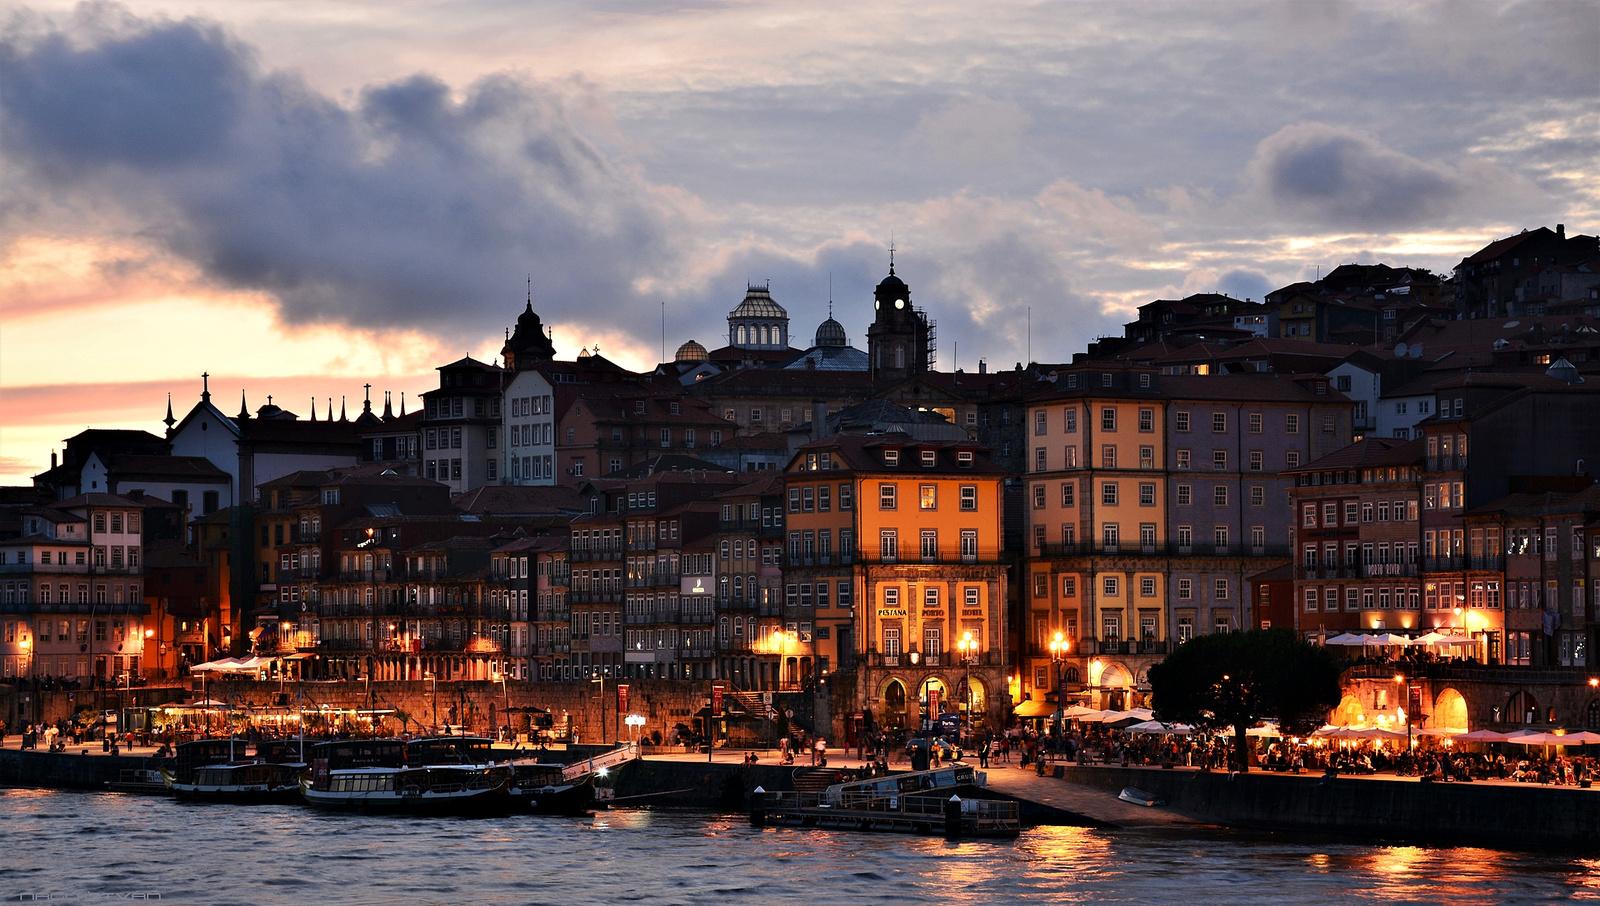 Porto - Bairro da Ribeira And Douro River At Sunset